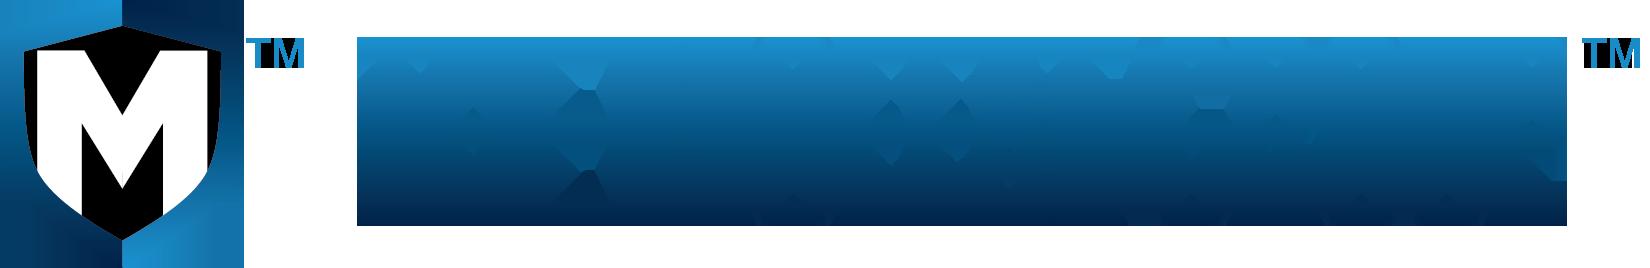 MG Horizontal Logo TM